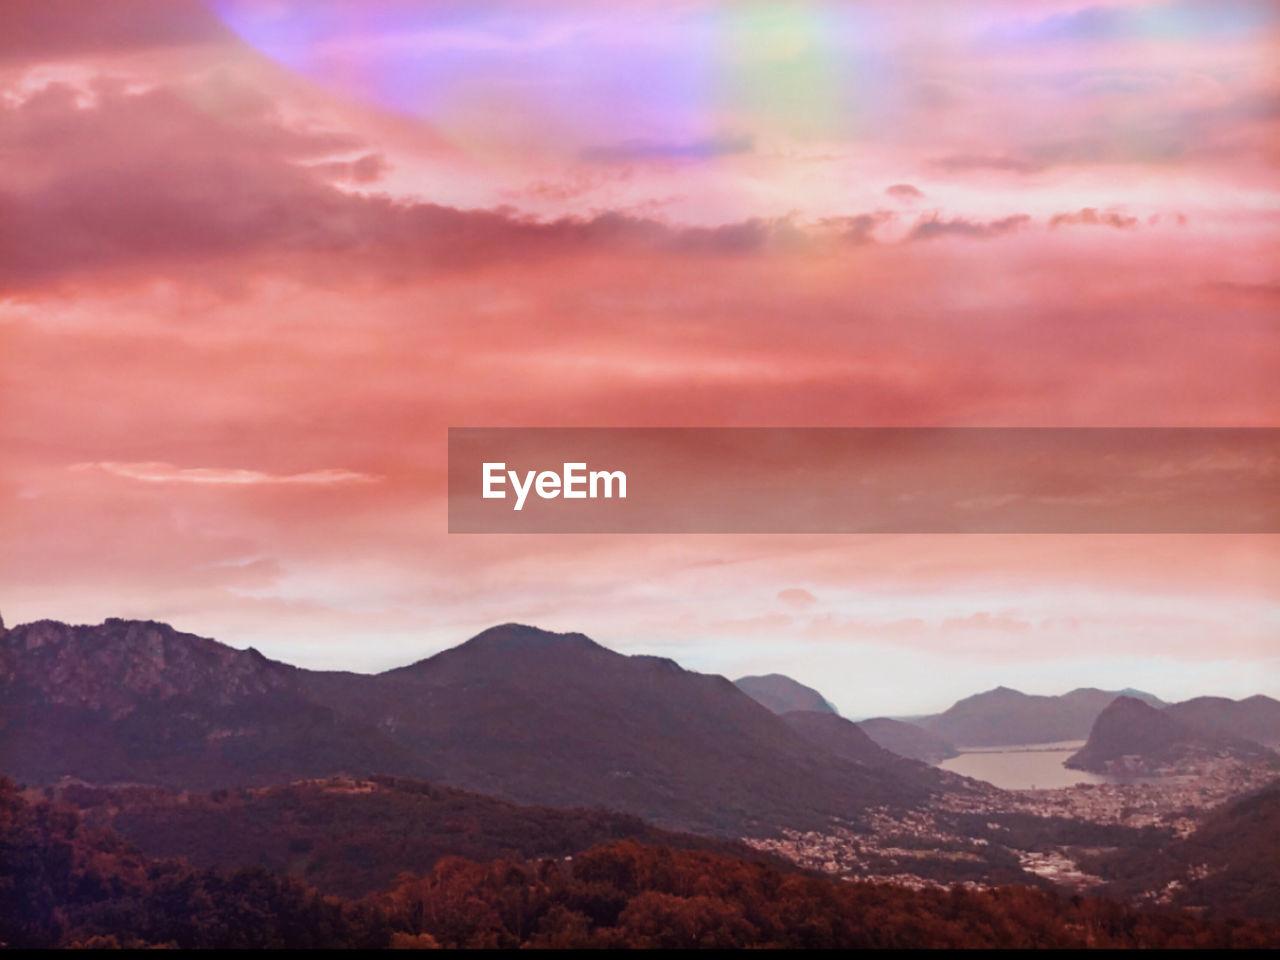 mountain, sky, cloud - sky, beauty in nature, scenics - nature, mountain range, tranquility, tranquil scene, sunset, nature, no people, idyllic, environment, outdoors, landscape, non-urban scene, dramatic sky, majestic, orange color, mountain peak